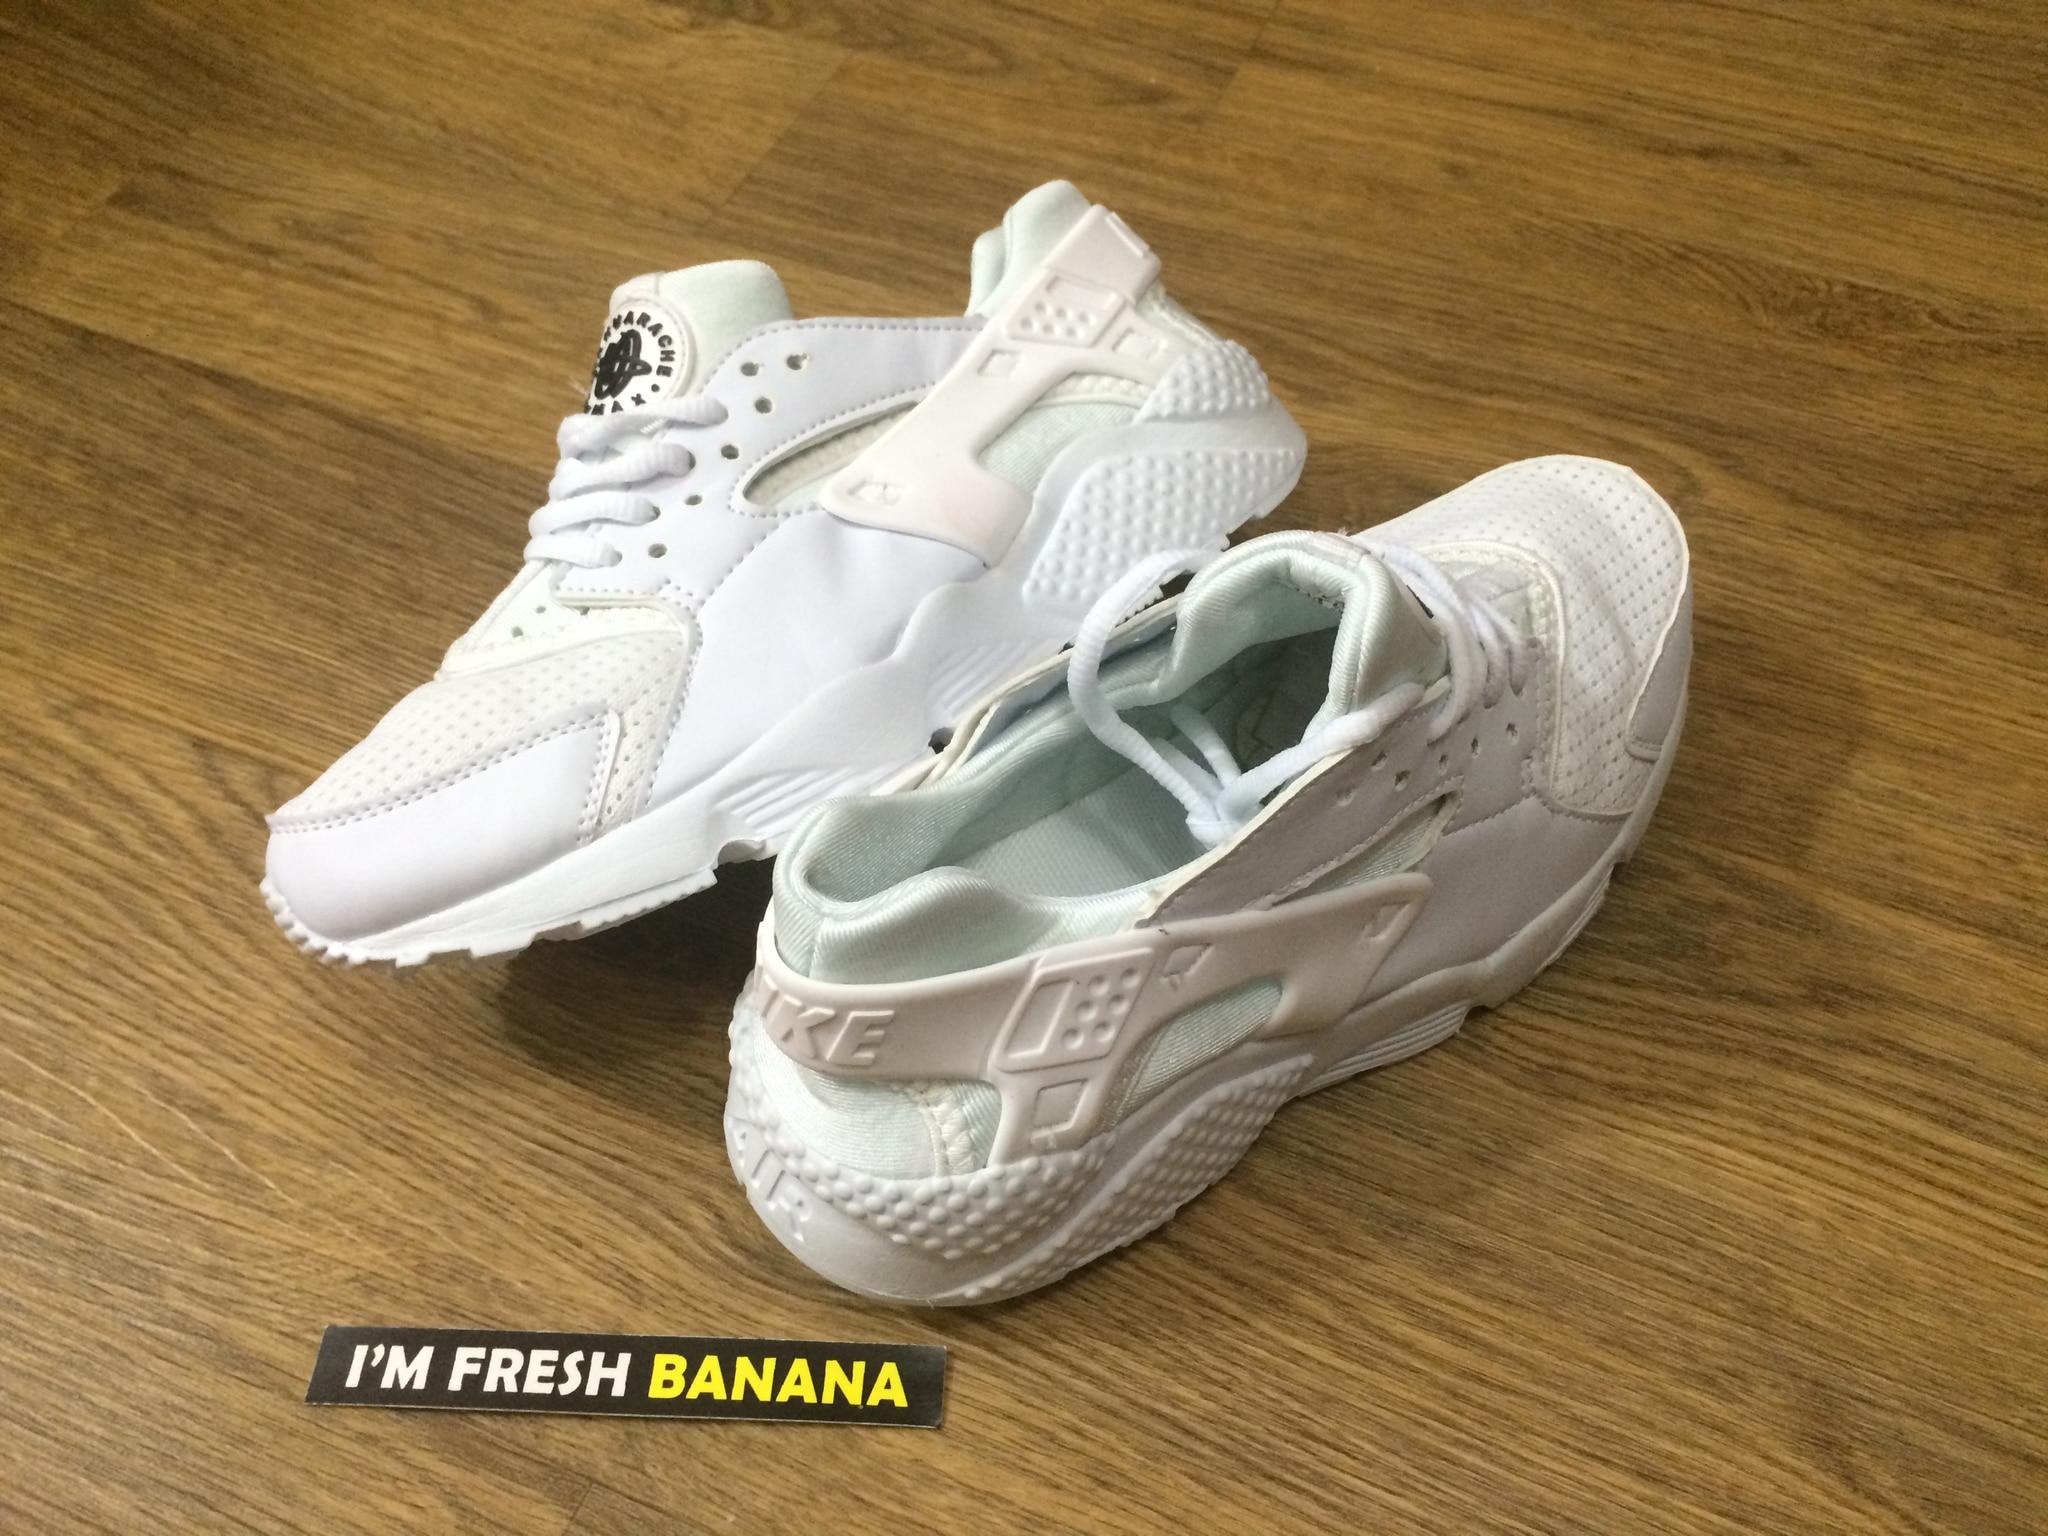 b2178c9c4b68 ... promo code for sepatu nike air huarache run triple full white putih ..  96838 b5558